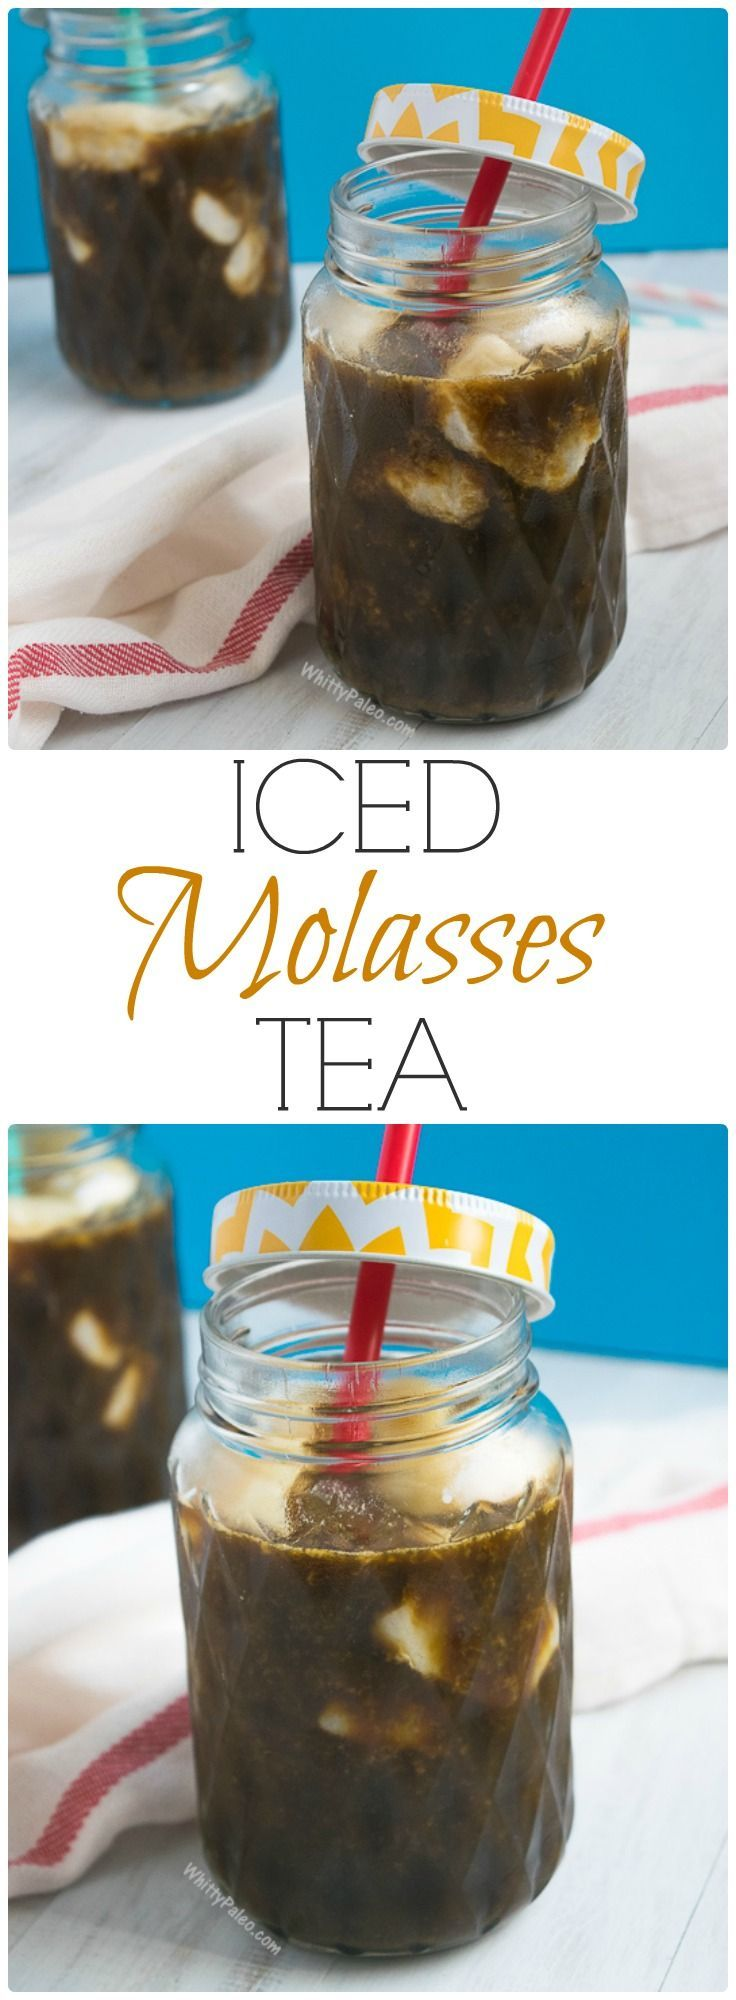 Organic Blackstrap Molasses Iced Tea + Health Benefits from WhittyPaleo.com